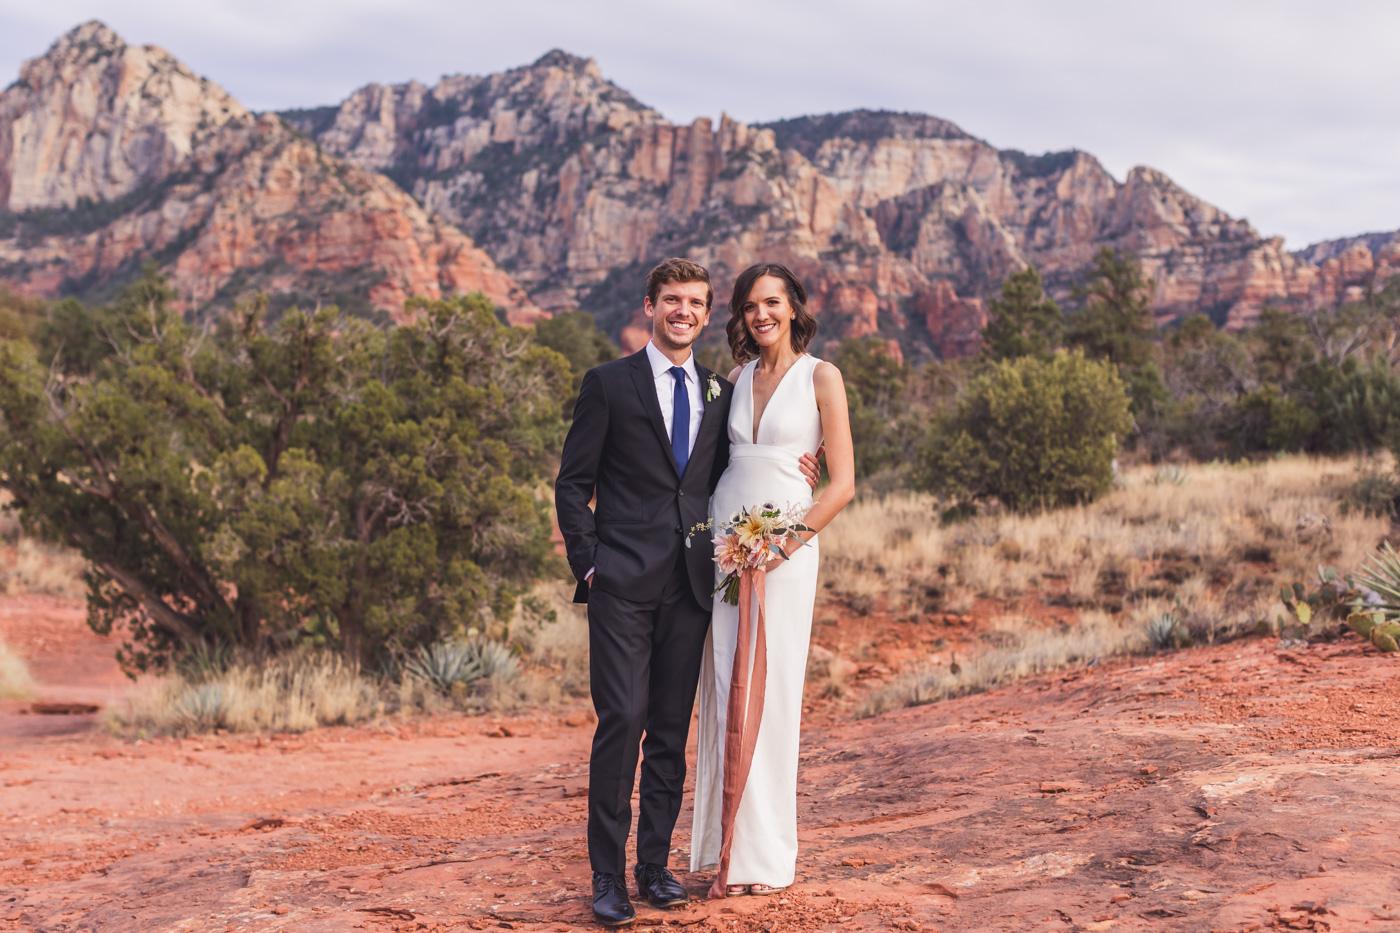 aaron-kes-photography-sedona-intimate-wedding-elopement-11.jpg